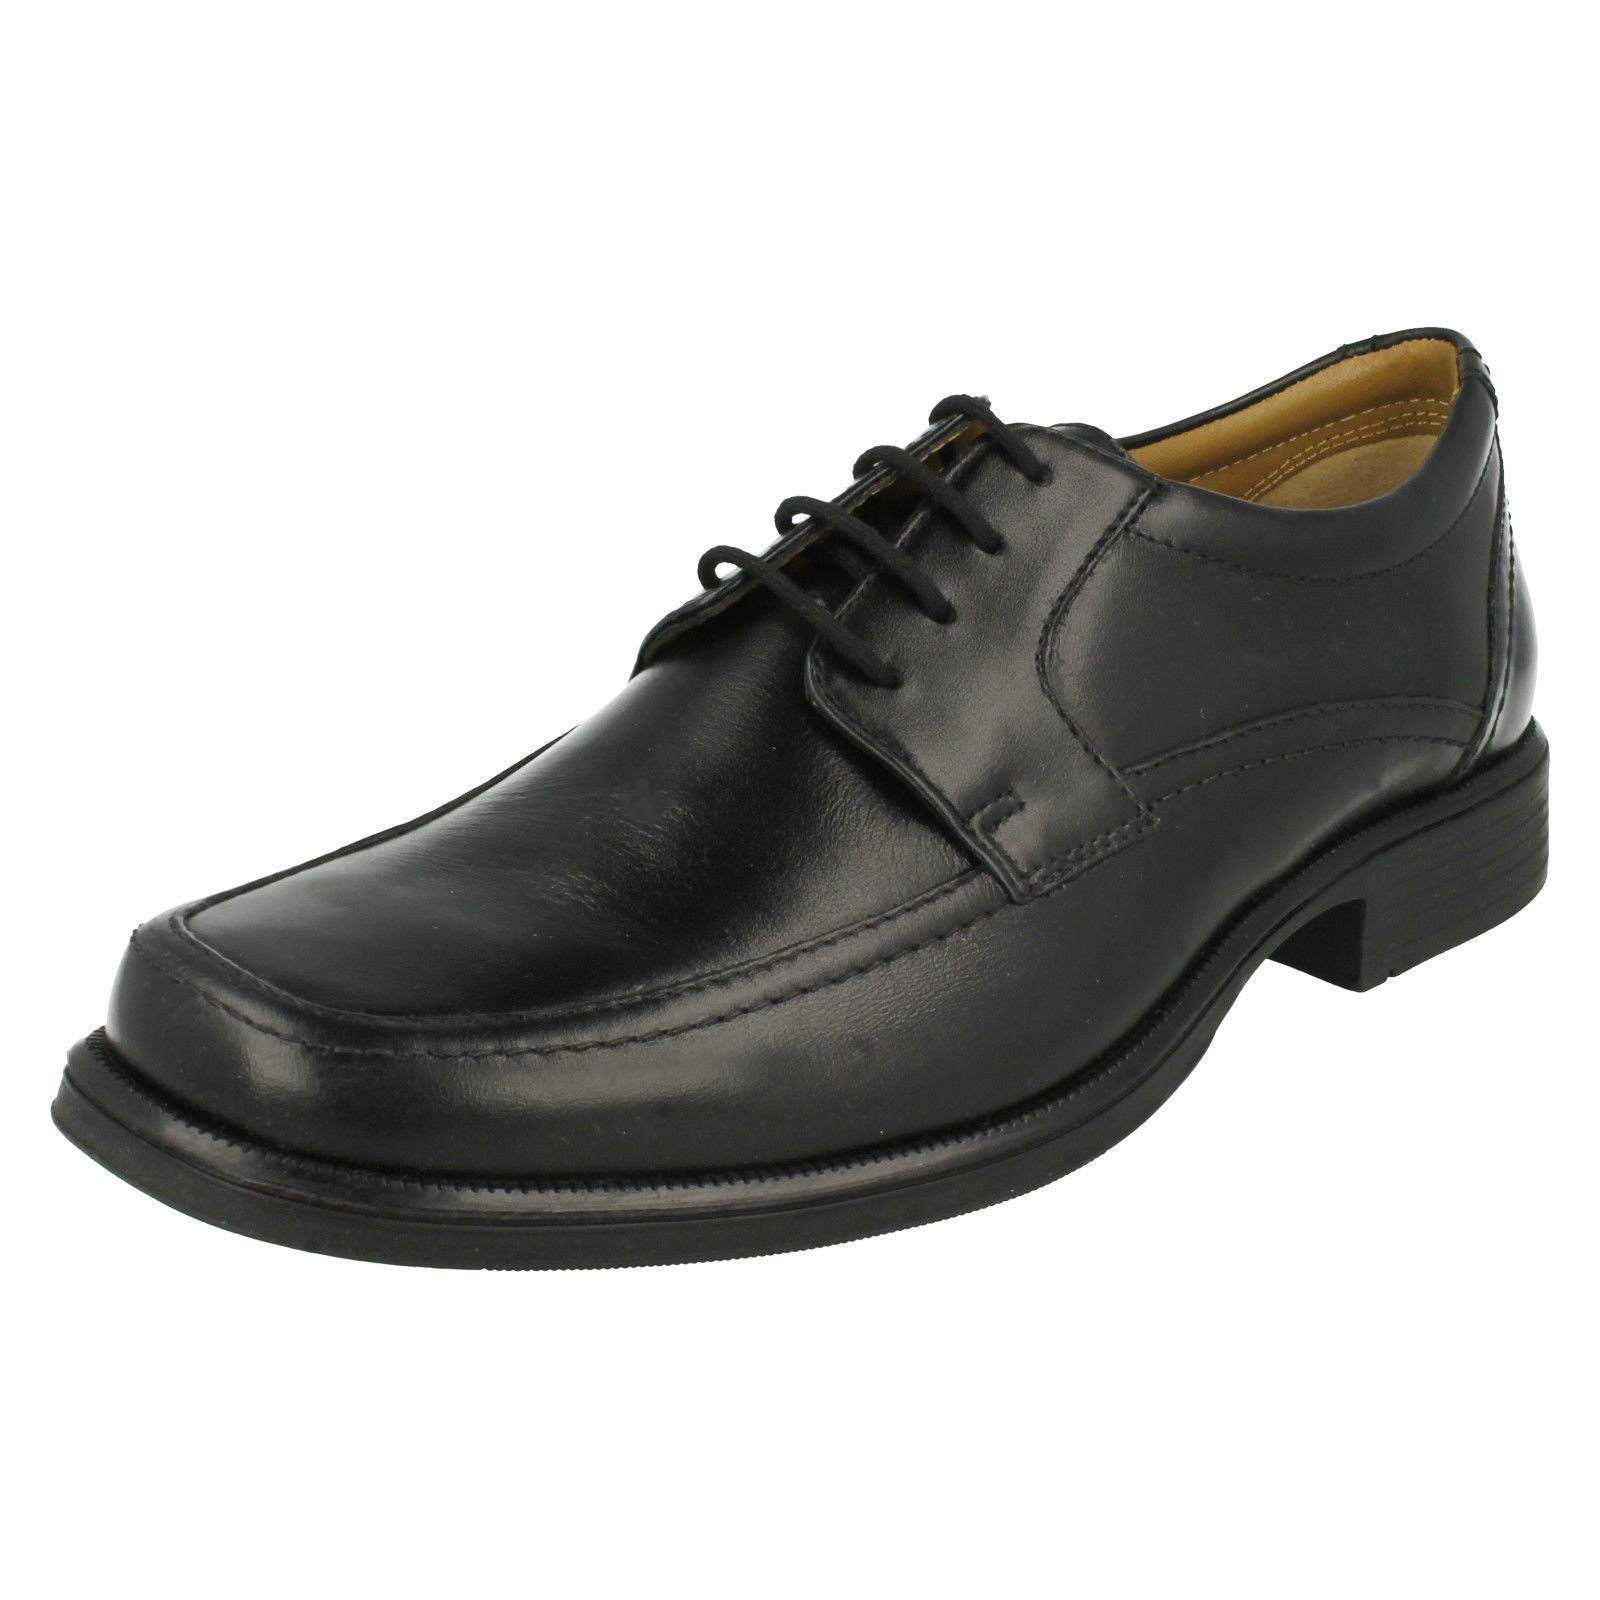 Uomo Clarks Handle Spring Scarpe stringate in pelle nera Calzabilità G Scarpe classiche da uomo